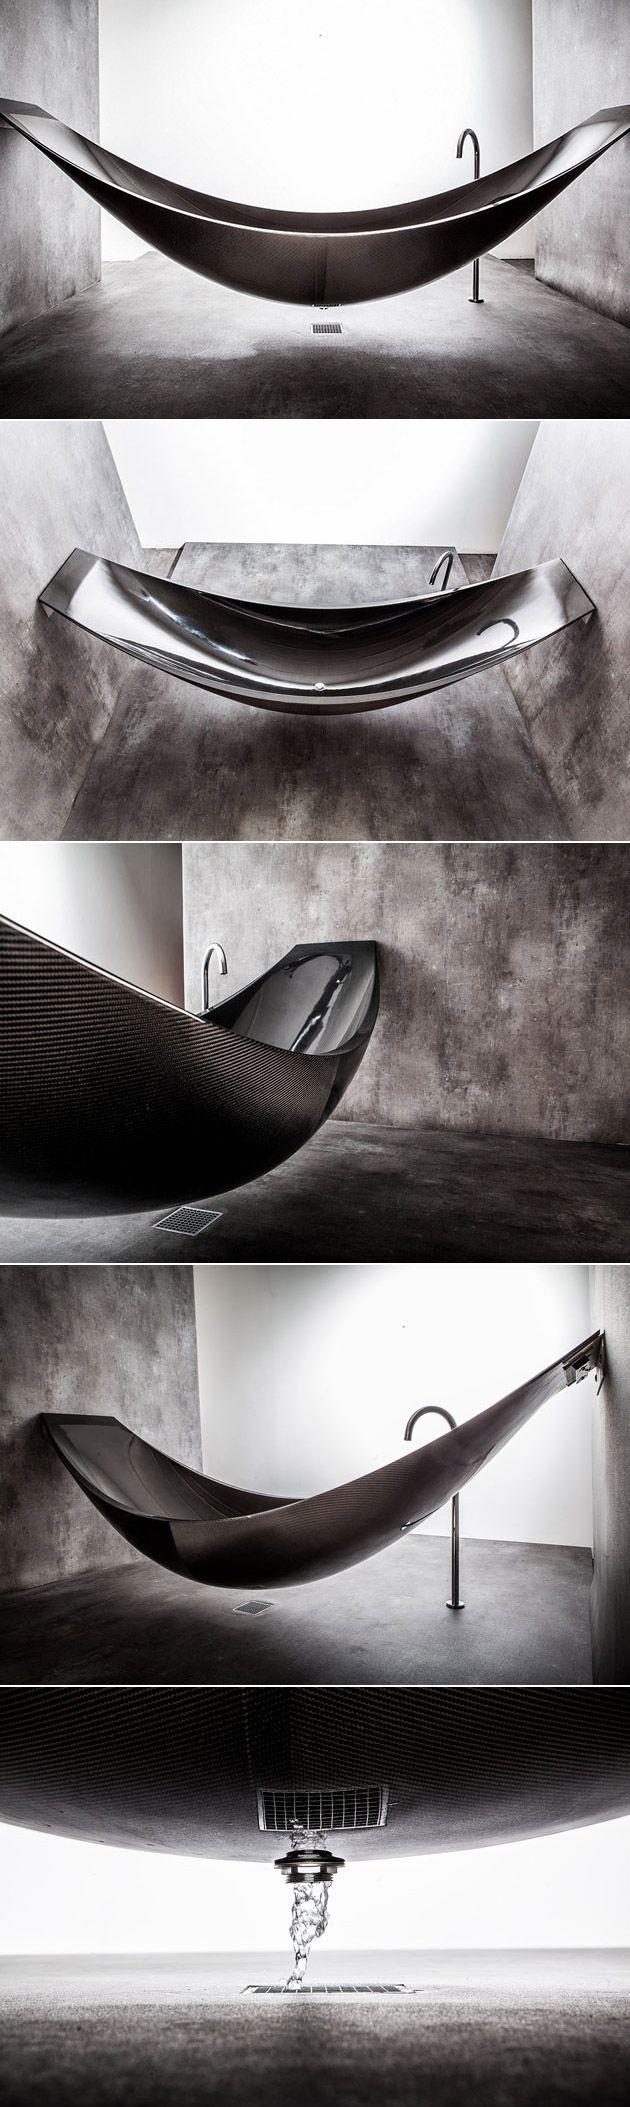 Best 25 carbon fiber ideas on pinterest wow deals slim for Carbon fiber hammock bathtub